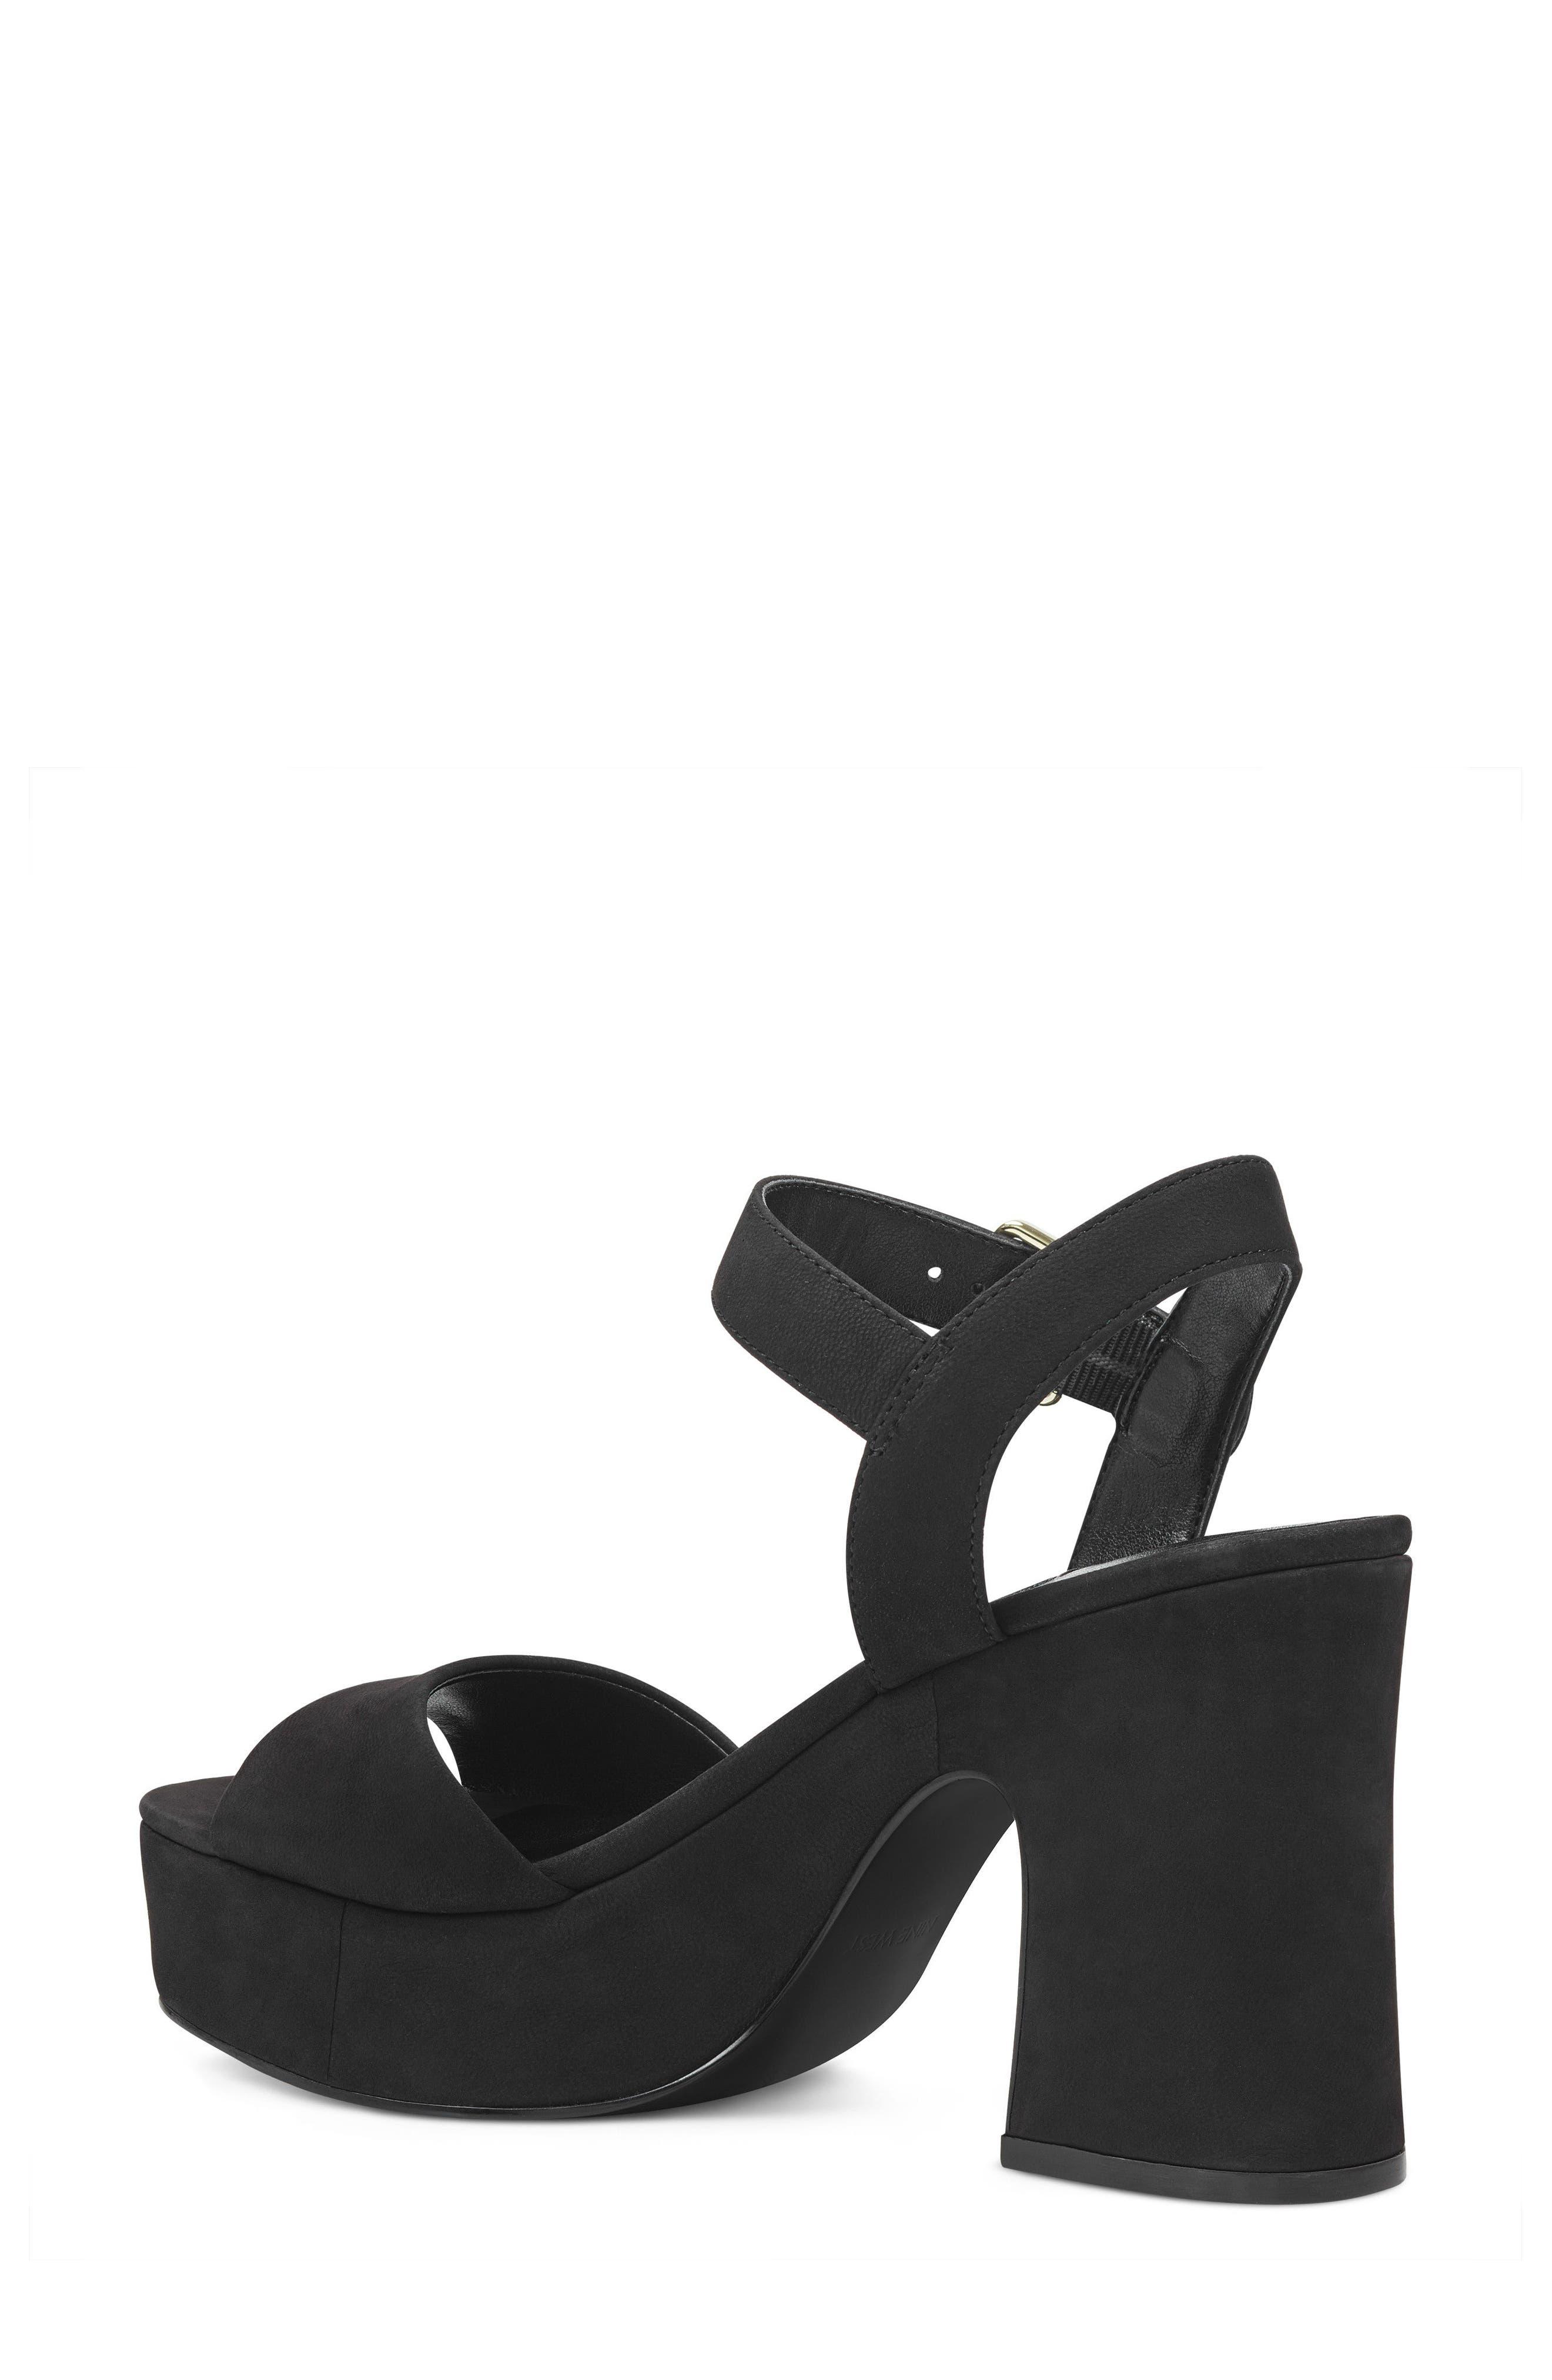 FallForU Platform Sandal,                             Alternate thumbnail 2, color,                             Black Leather